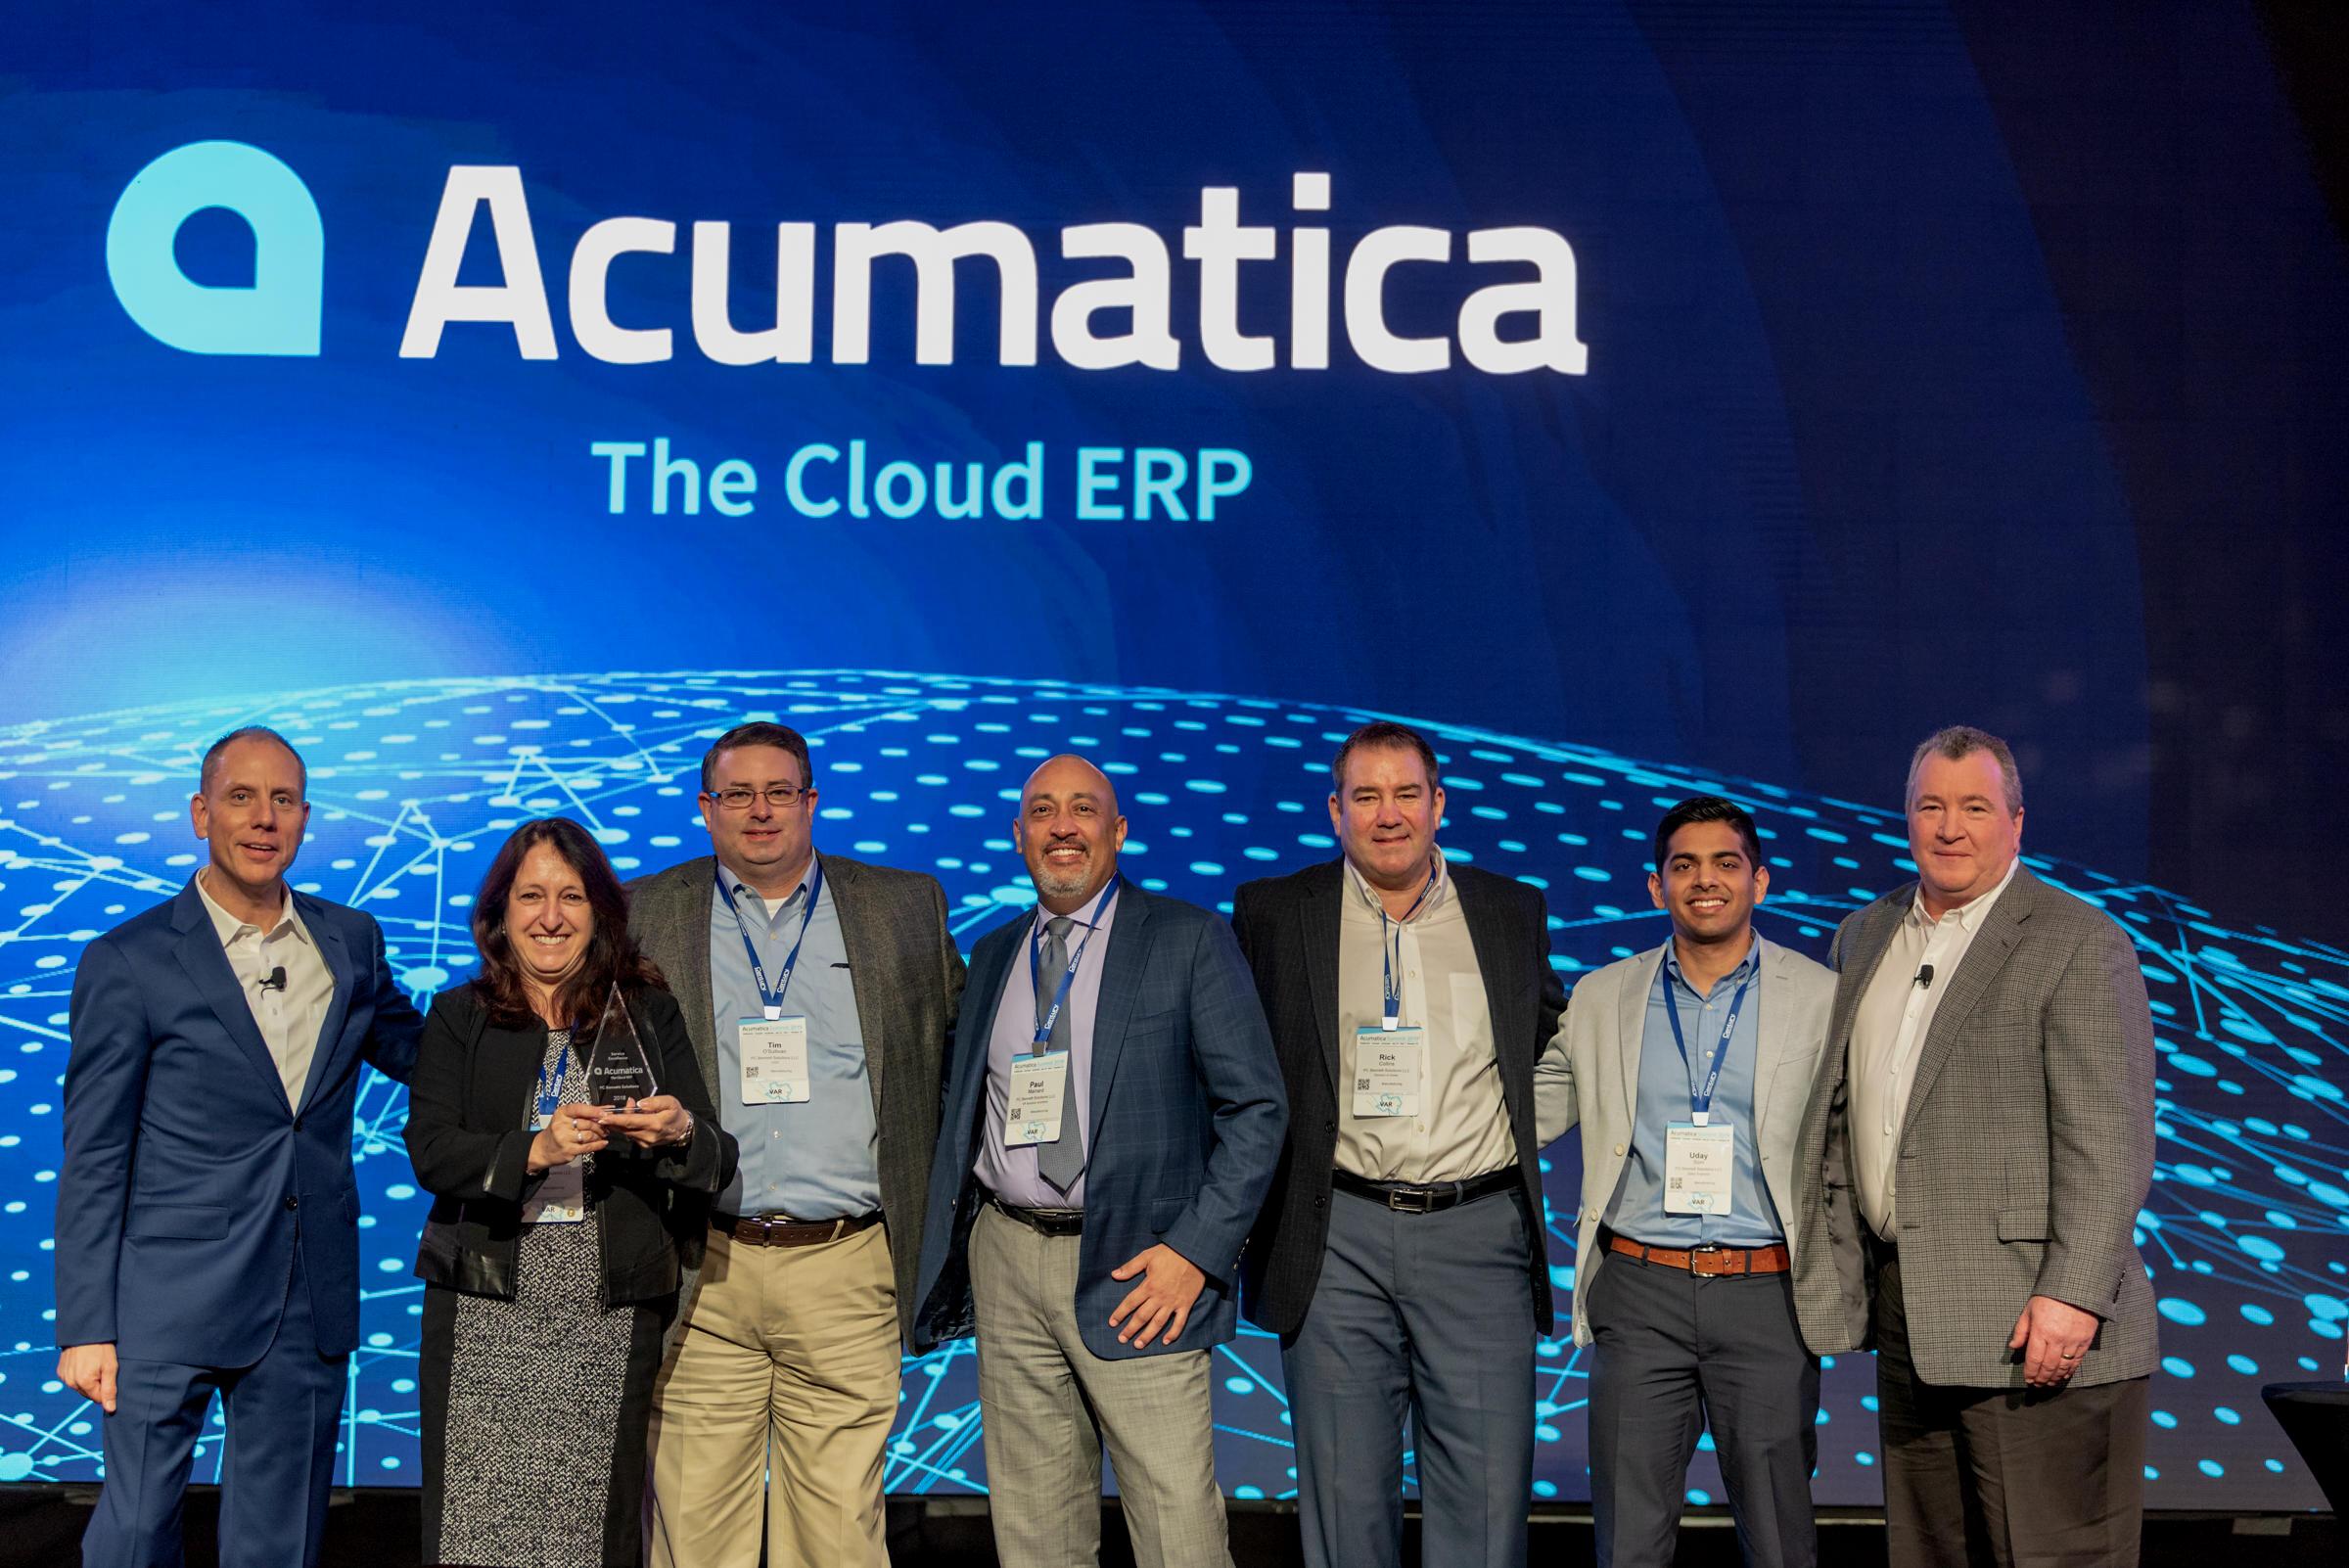 PC Bennett accepting award for Acumatica ERP MVP.